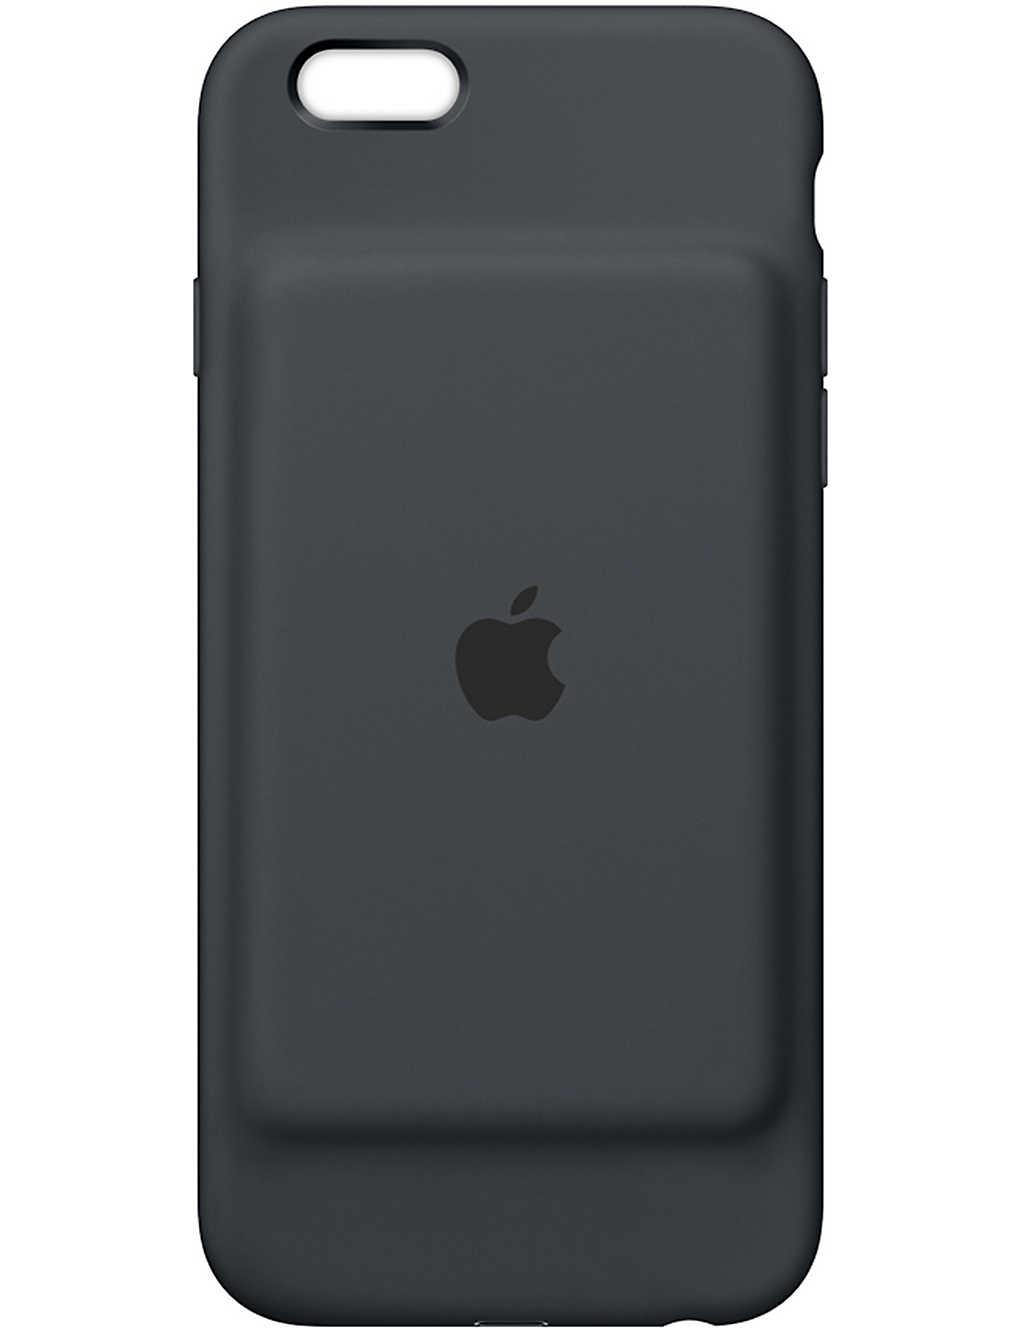 b80dff482 APPLE - iPhone 6/6s smart battery case charcoal grey | Selfridges.com